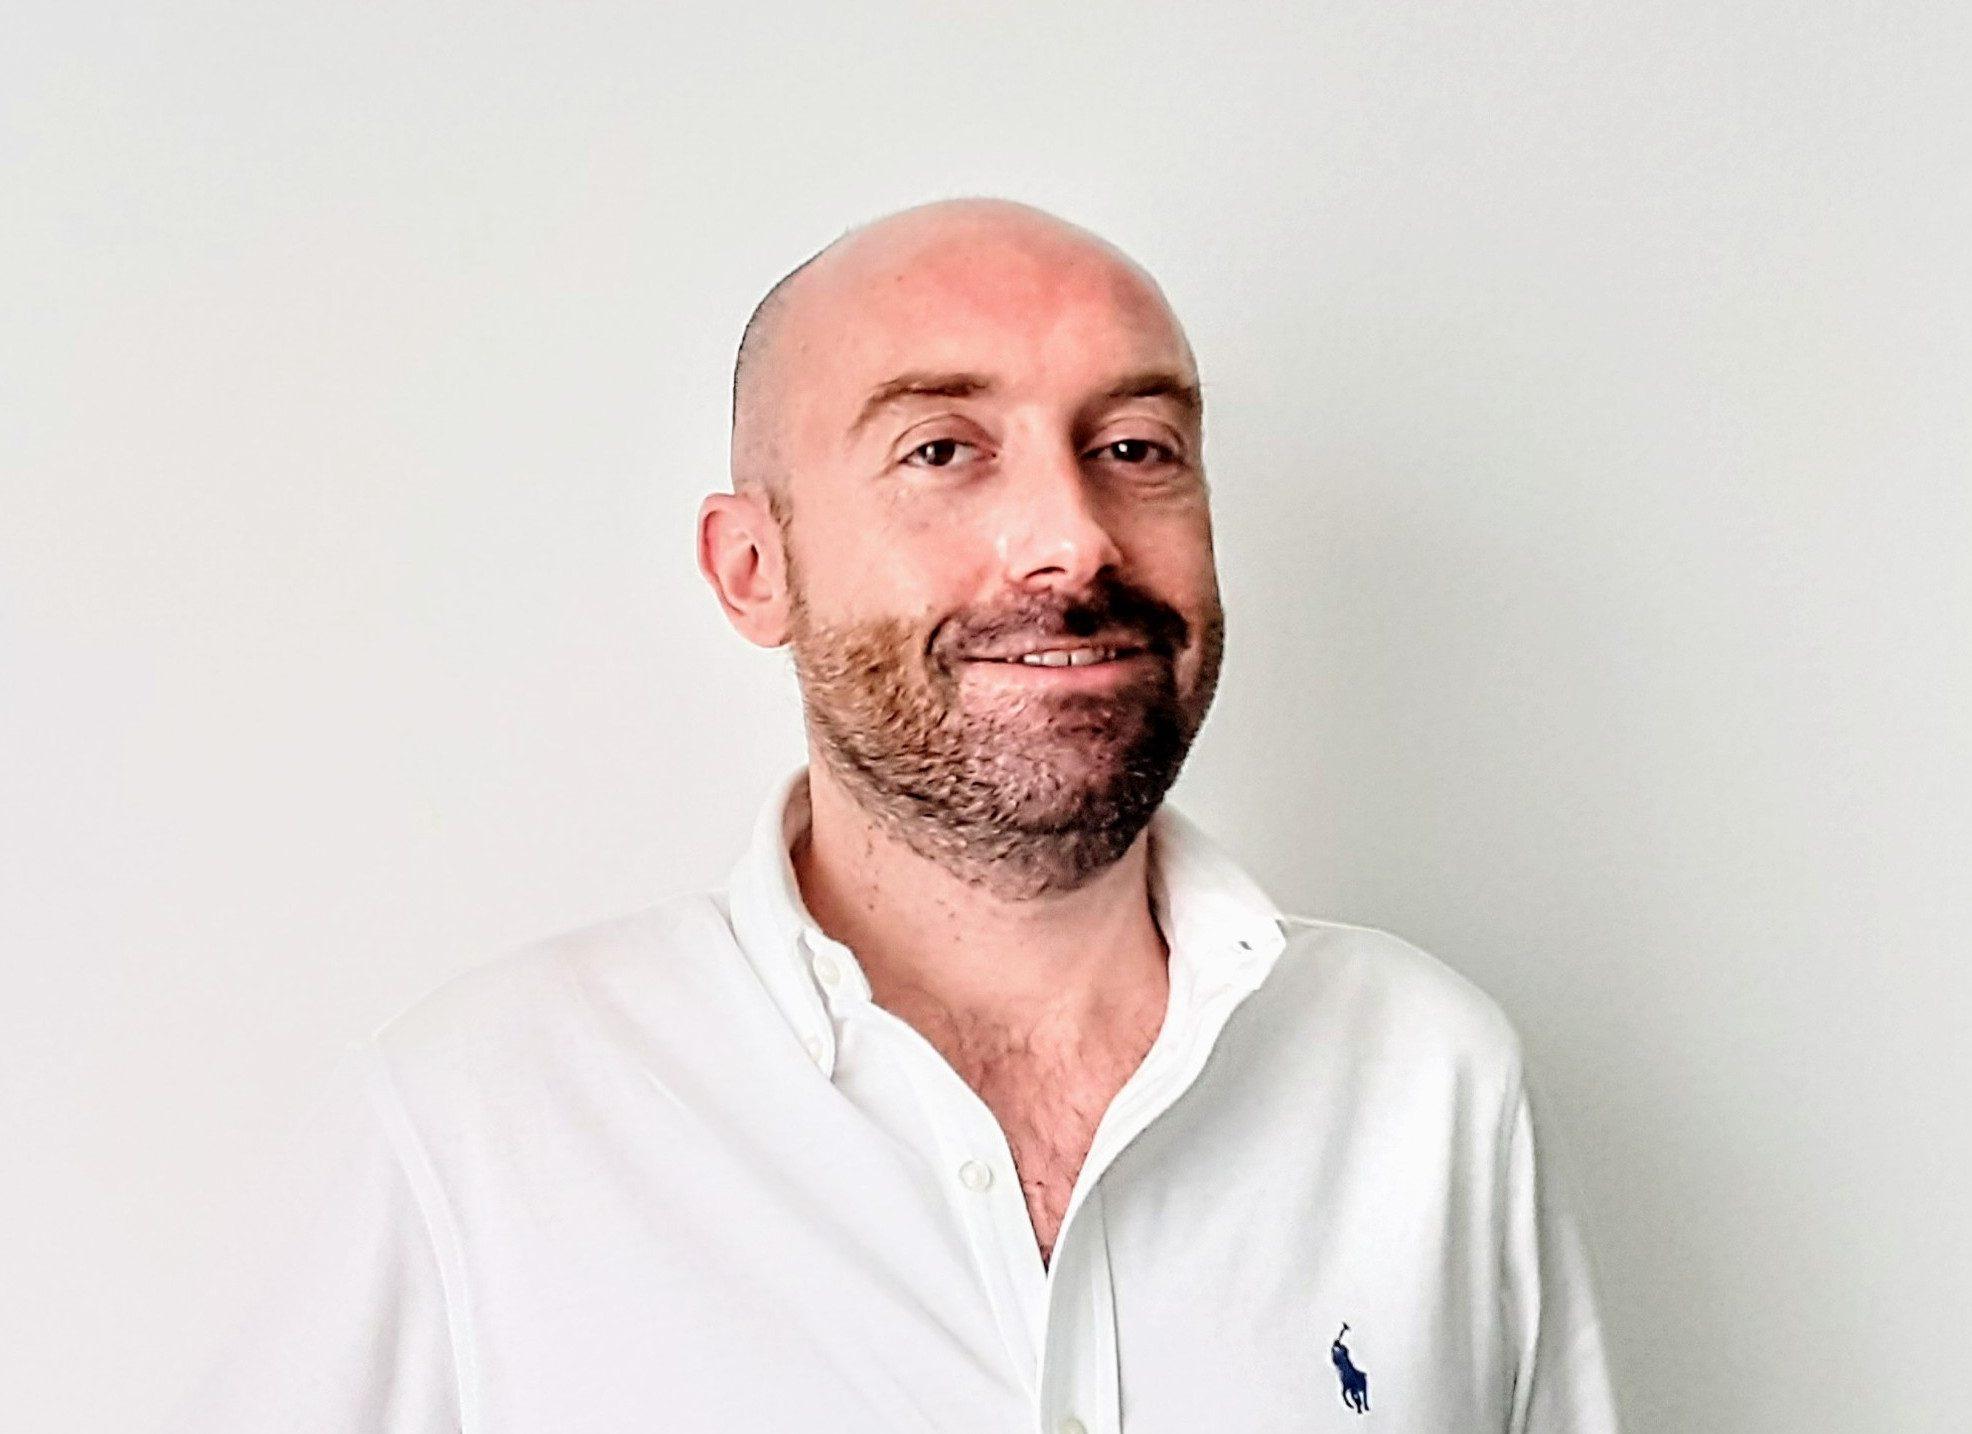 Stefano Manodoro